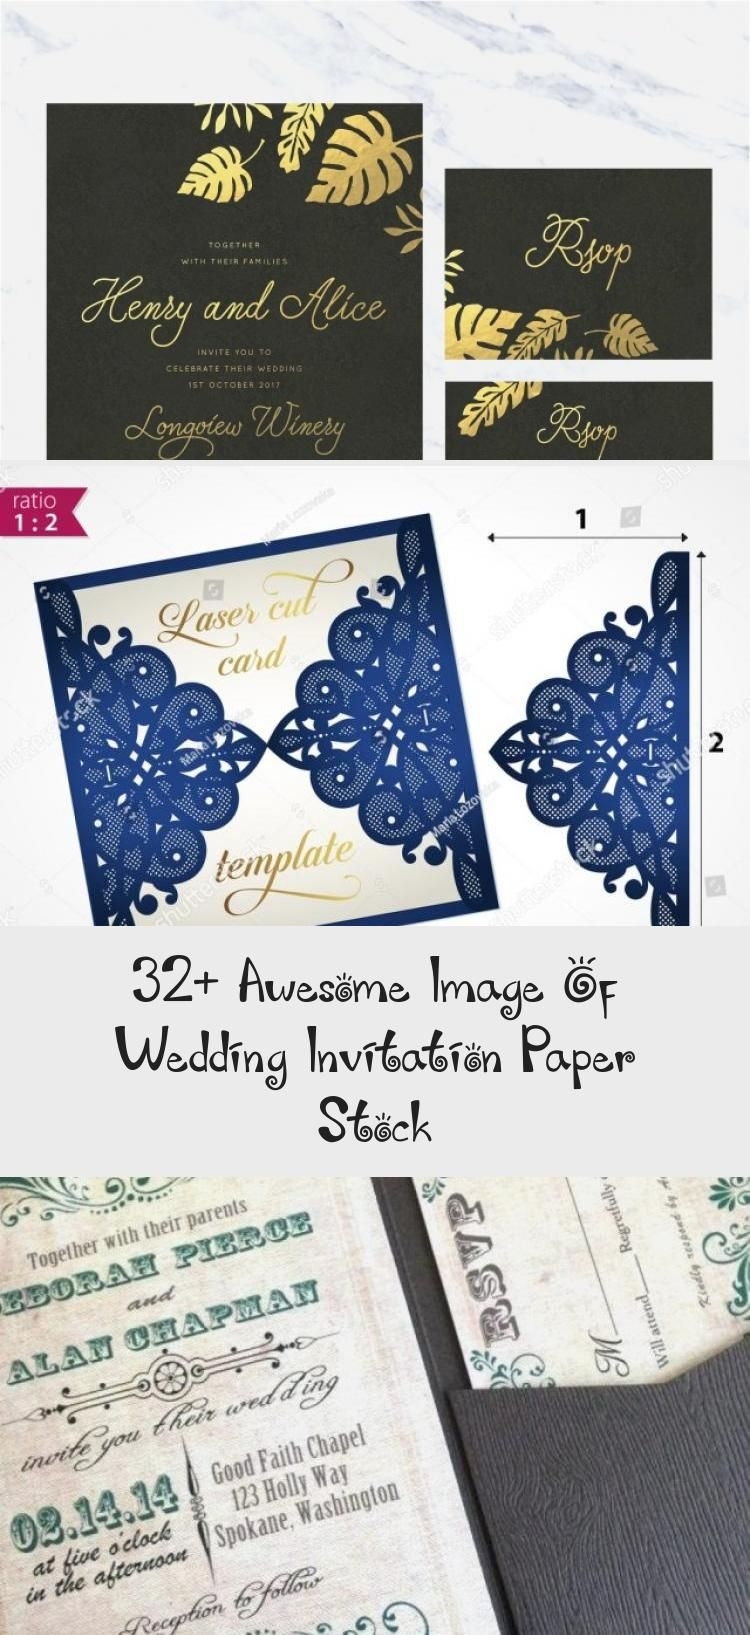 32 Awesome Image Of Wedding Invitation Paper Stock Wedding Invitation Paper Wedding Invitations Fun Wedding Invitations